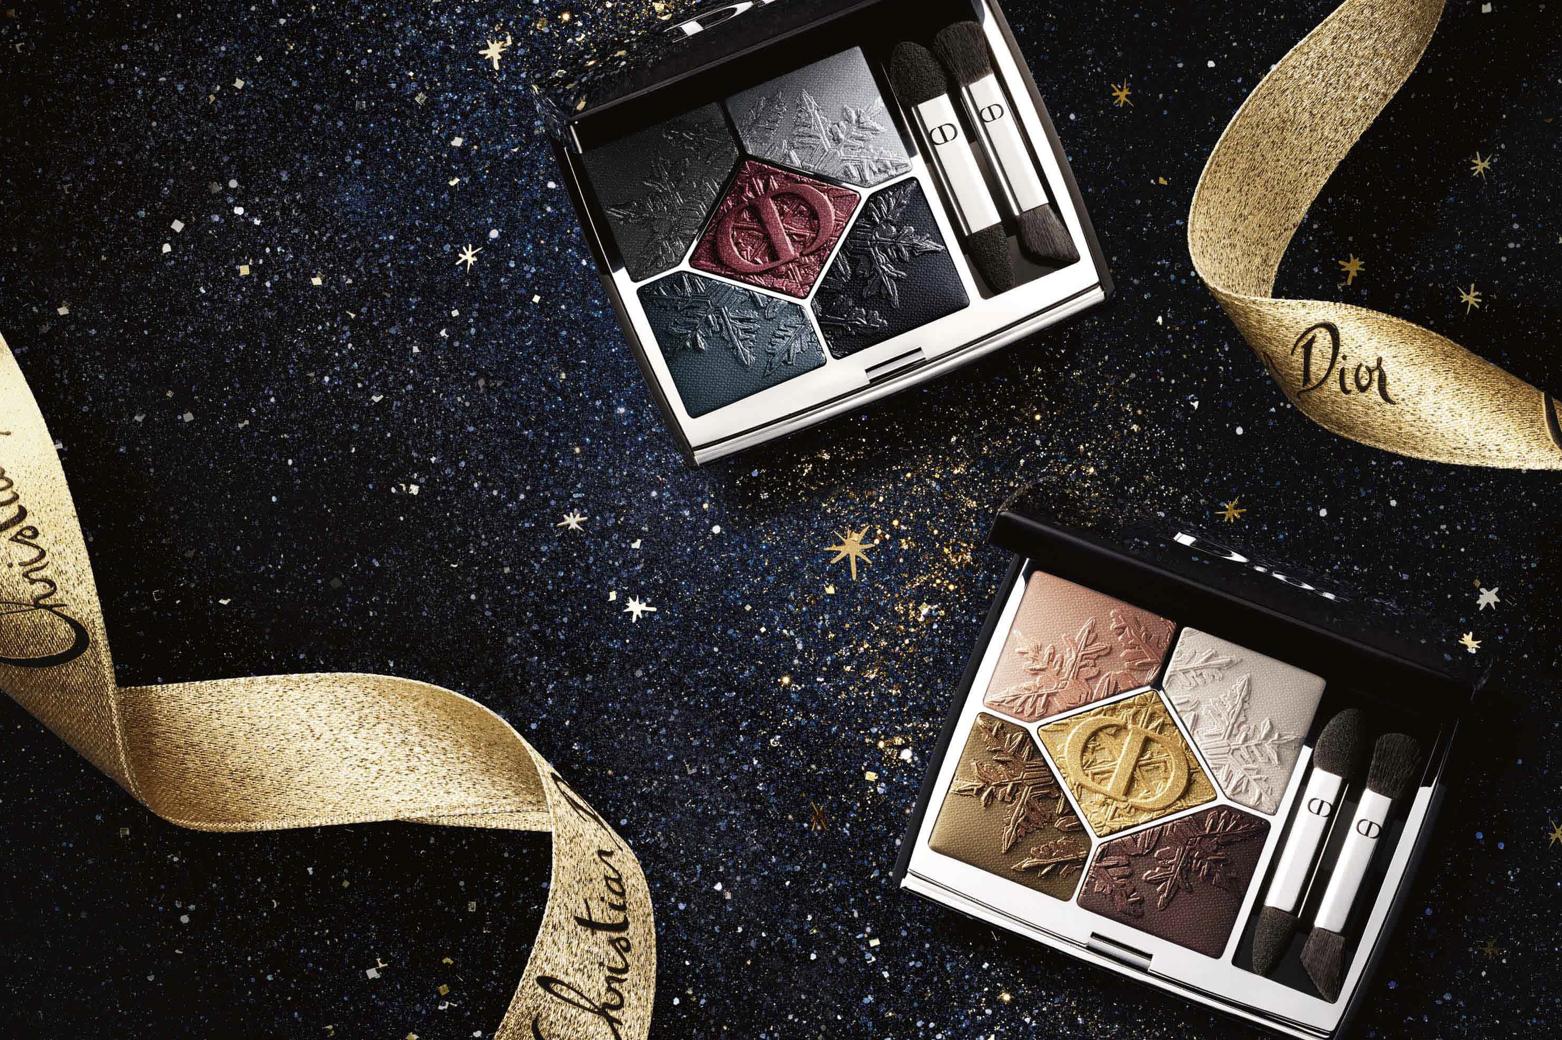 Dior Maquillage Noël 2020 Palette 5 Couleurs